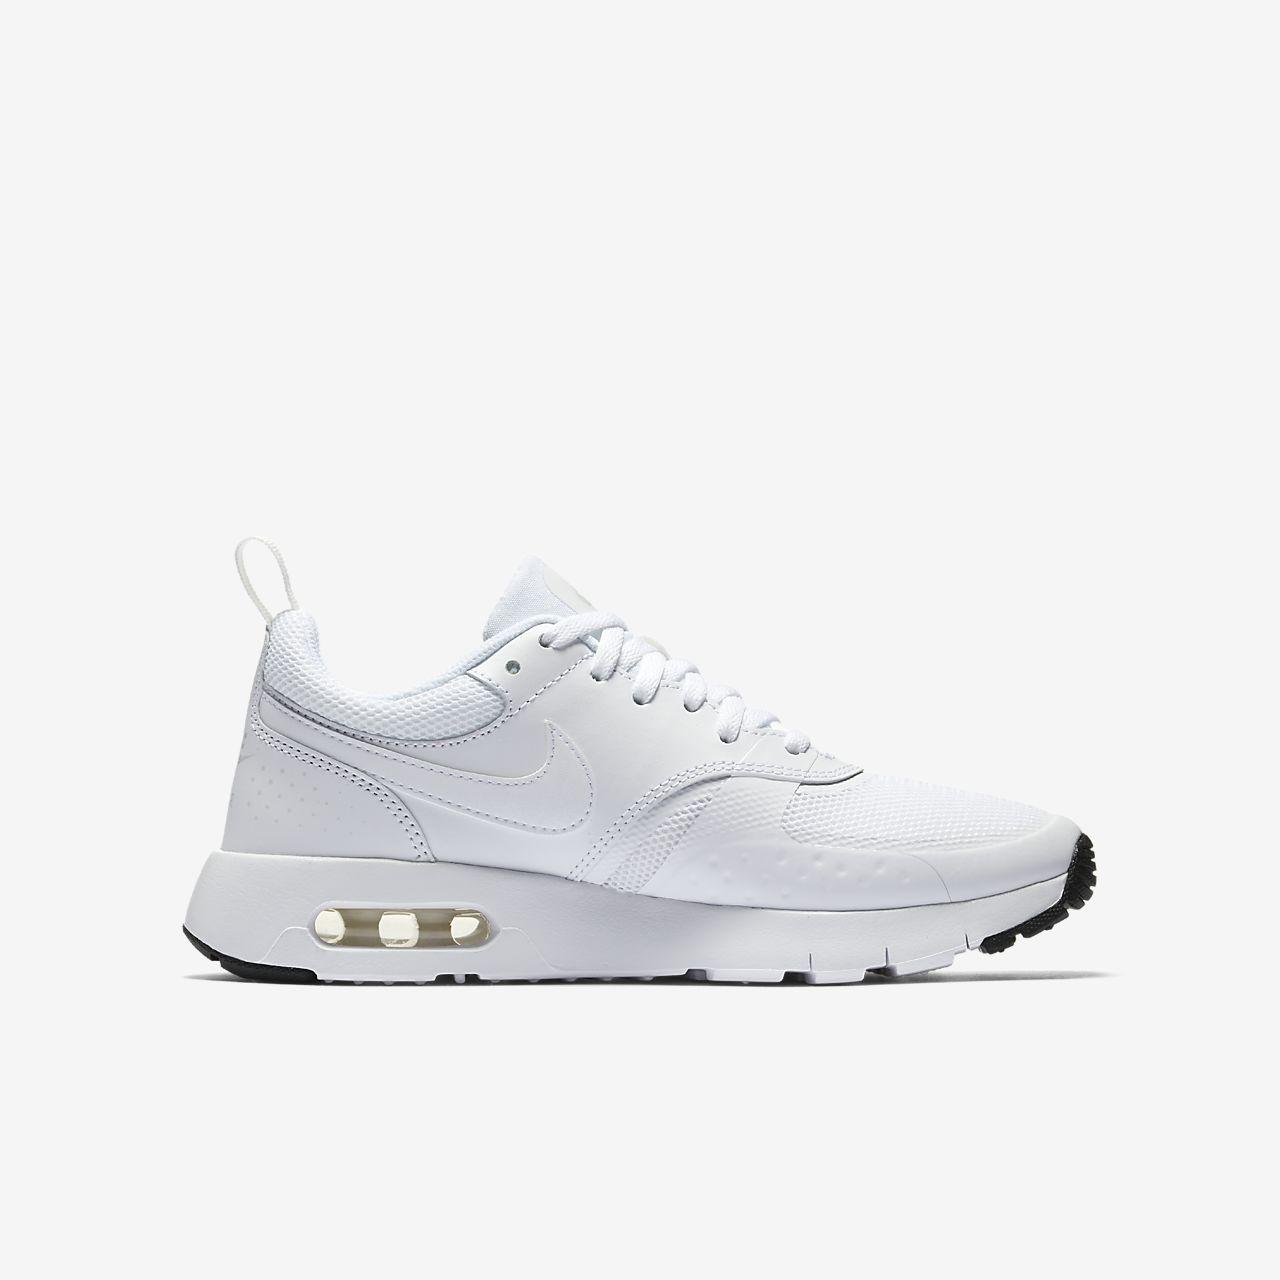 check out ae3e2 cf216 ... Chaussure Nike Air Max Vision pour Enfant plus âgé